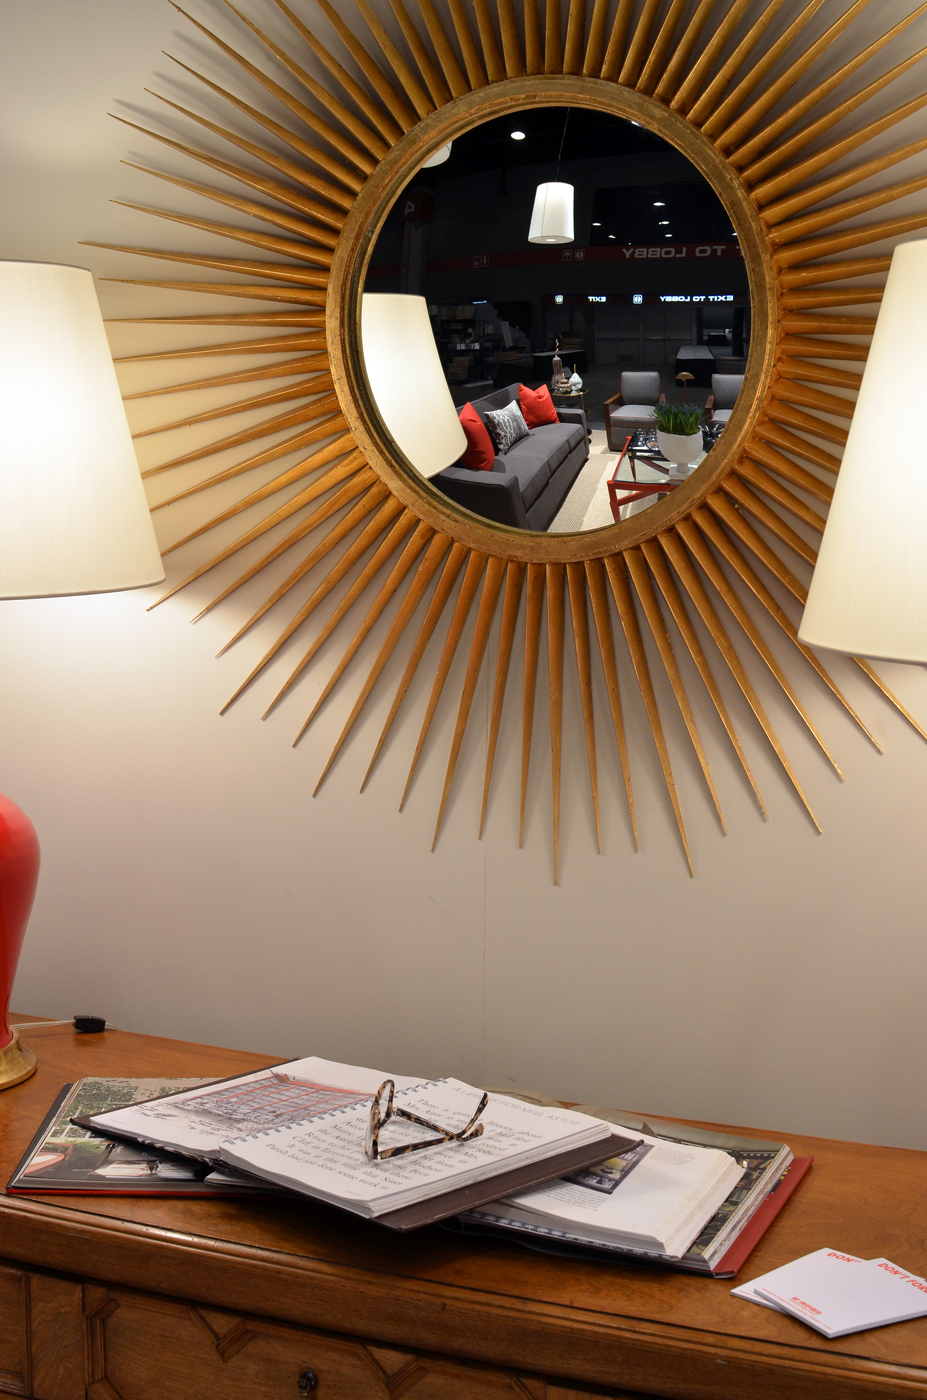 Gold sunburst decorative mirror over antique console table | Savage Interior Design